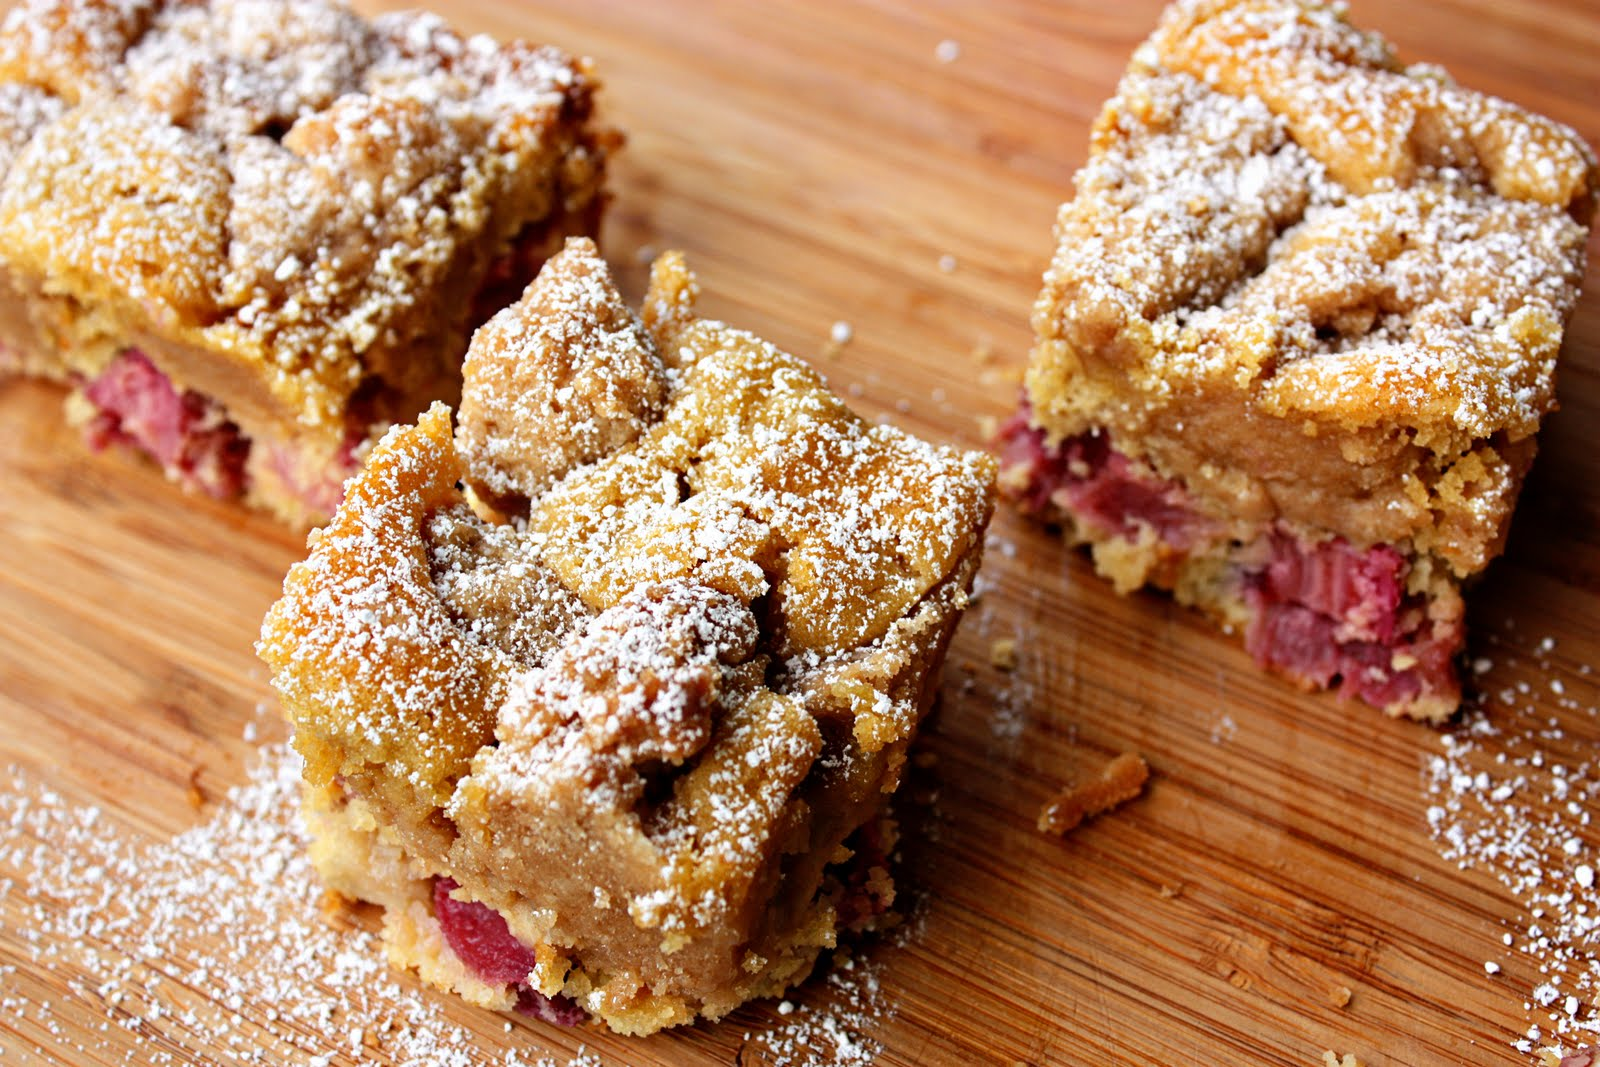 Delightful Bitefuls: Rhubarb 'Big Crumb' Coffee Cake